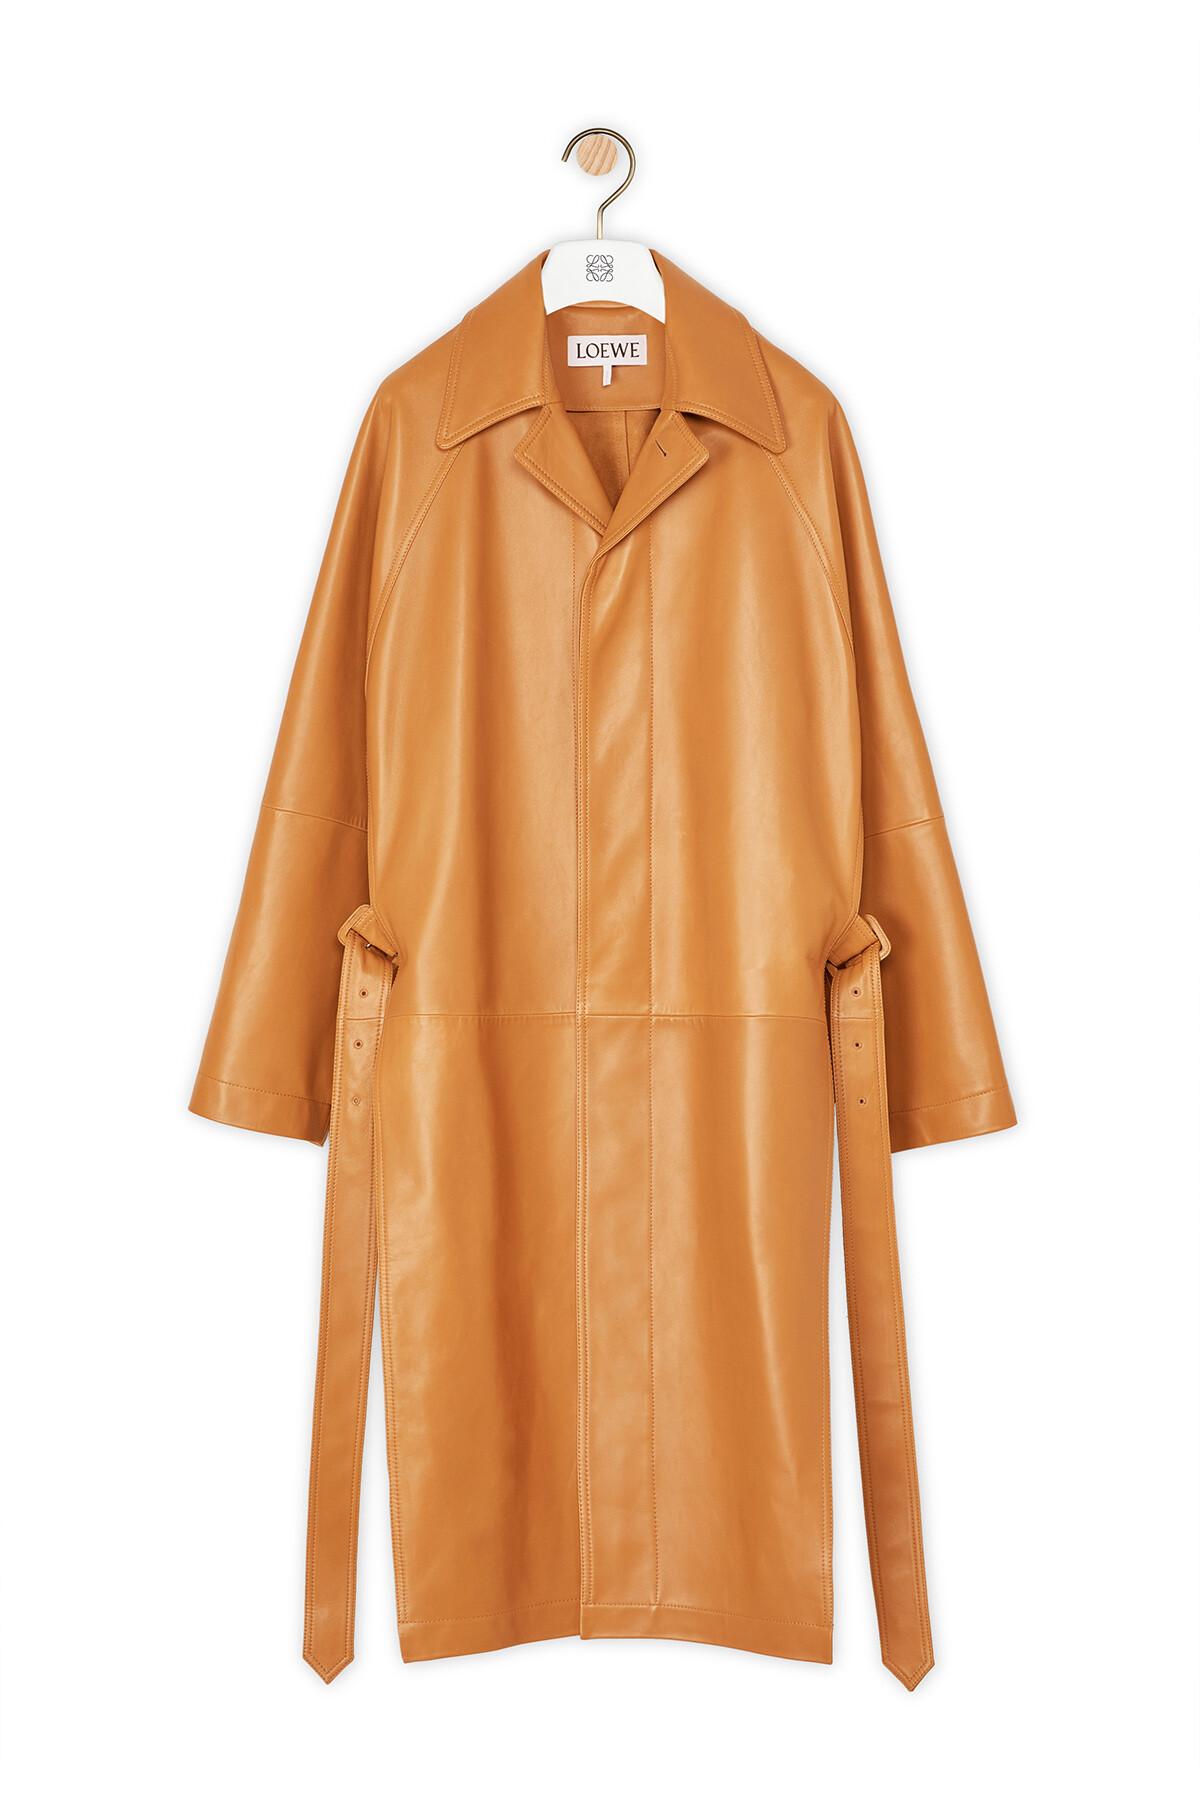 LOEWE Coat Toffee front